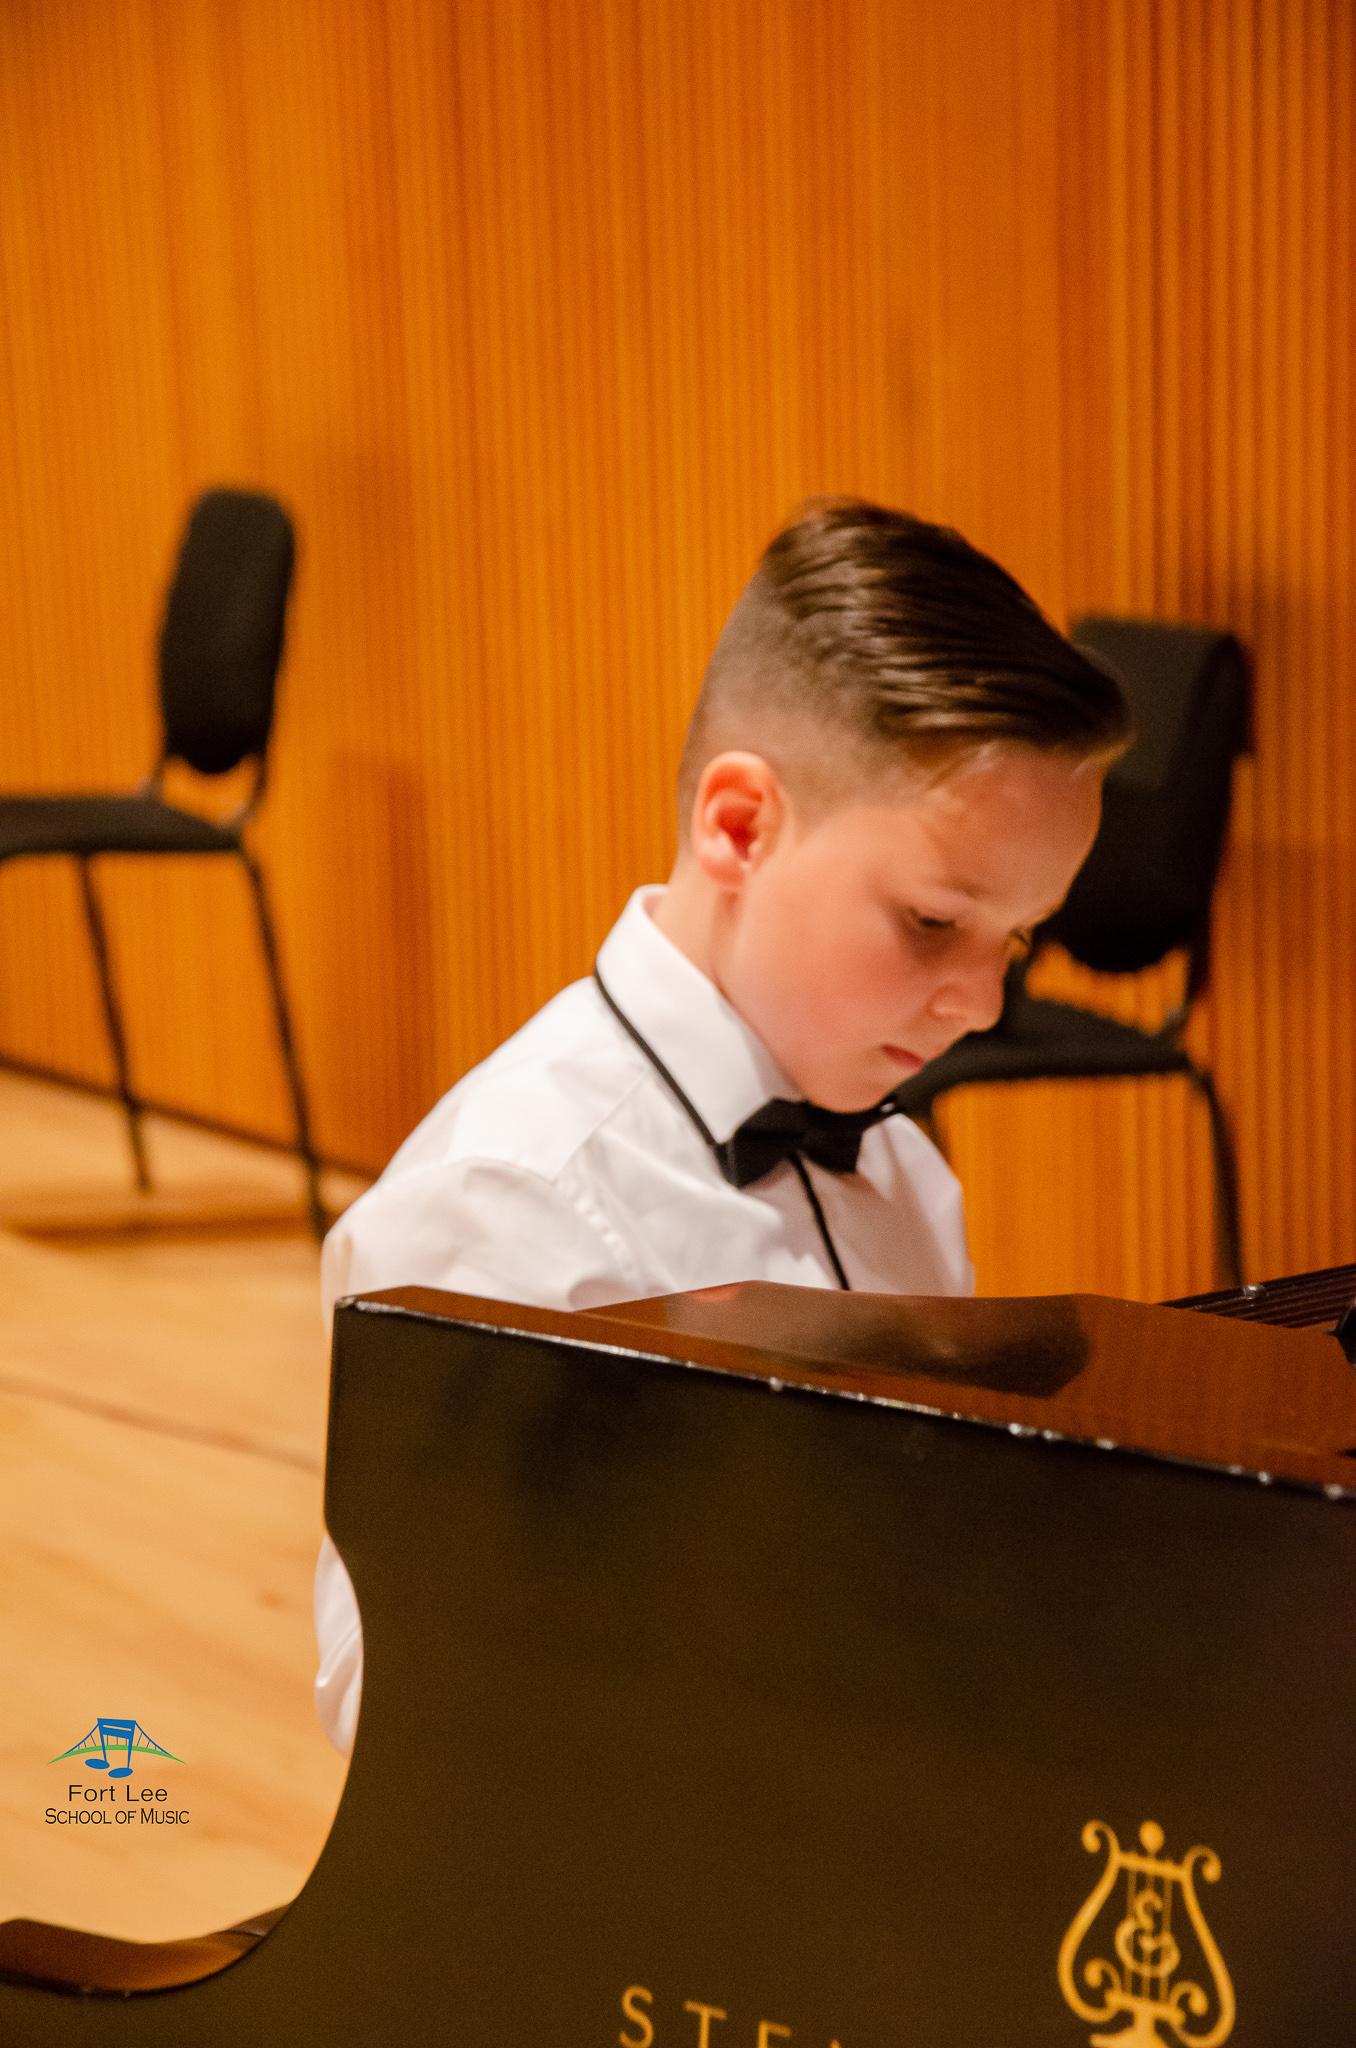 piano-lessons-for-children.jpg